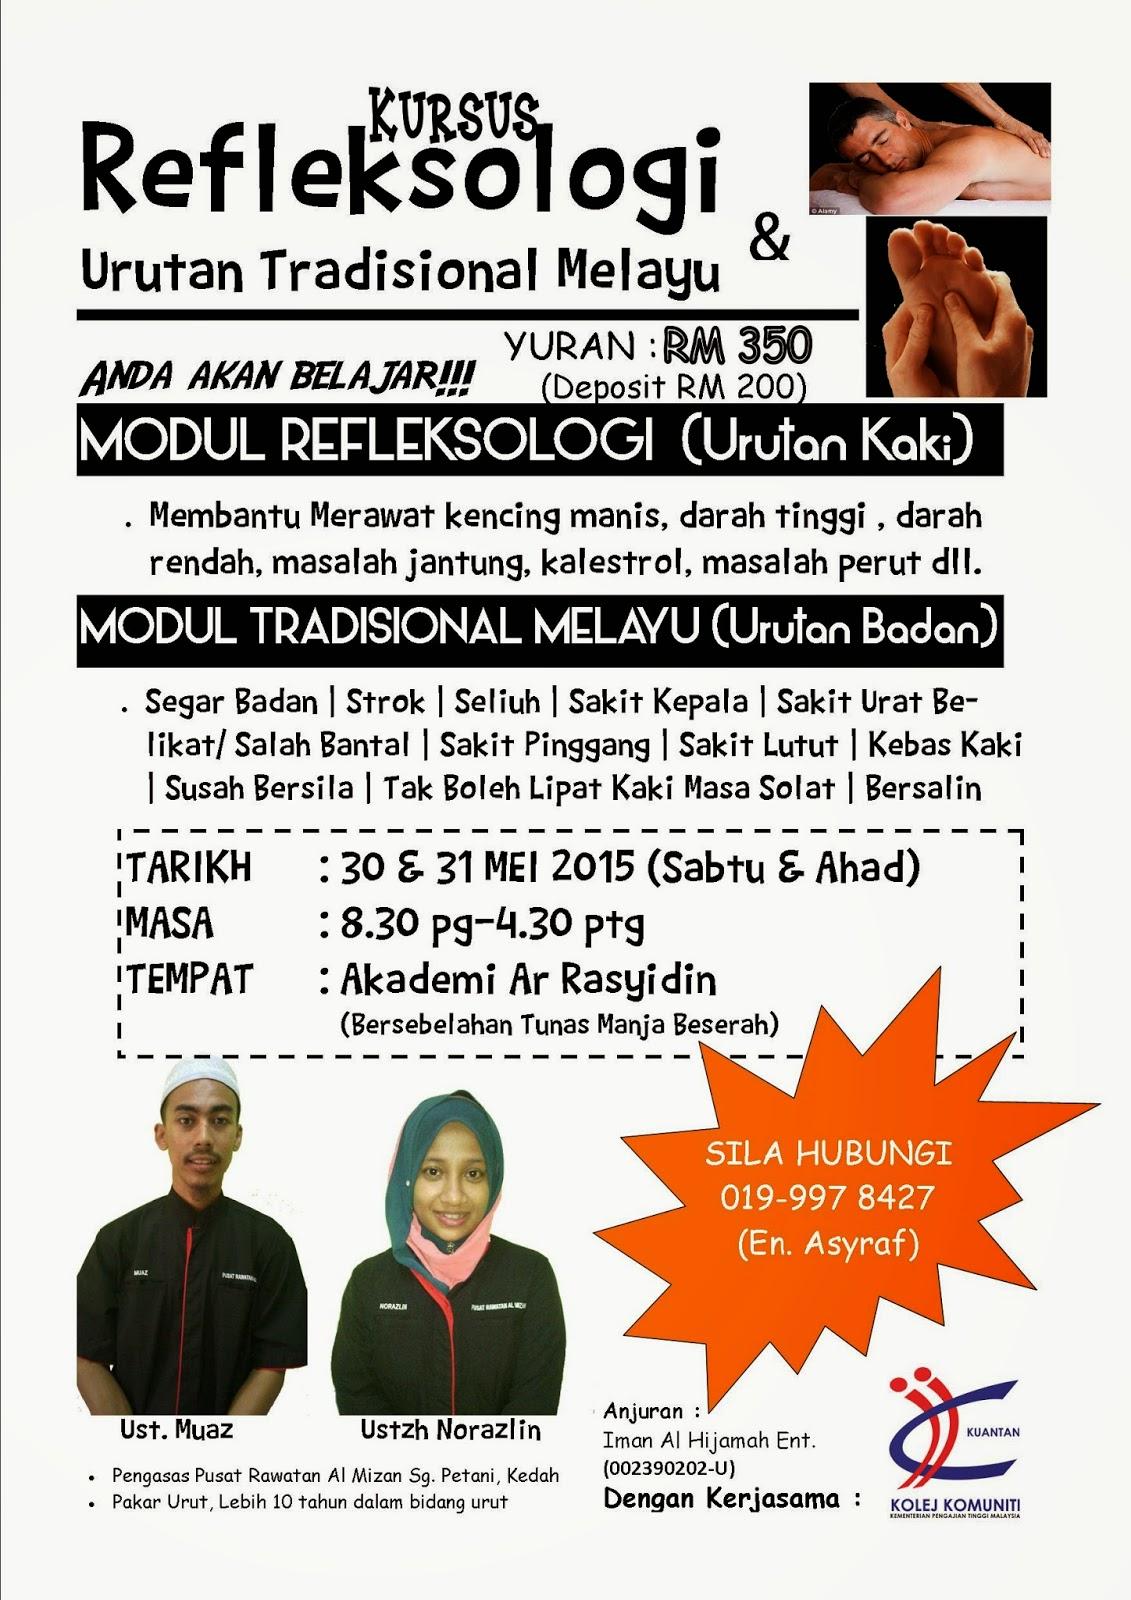 Kursus Refleksologi & Urutan Tradisional Melayu 30-31 MEI 2015 di Kuantan